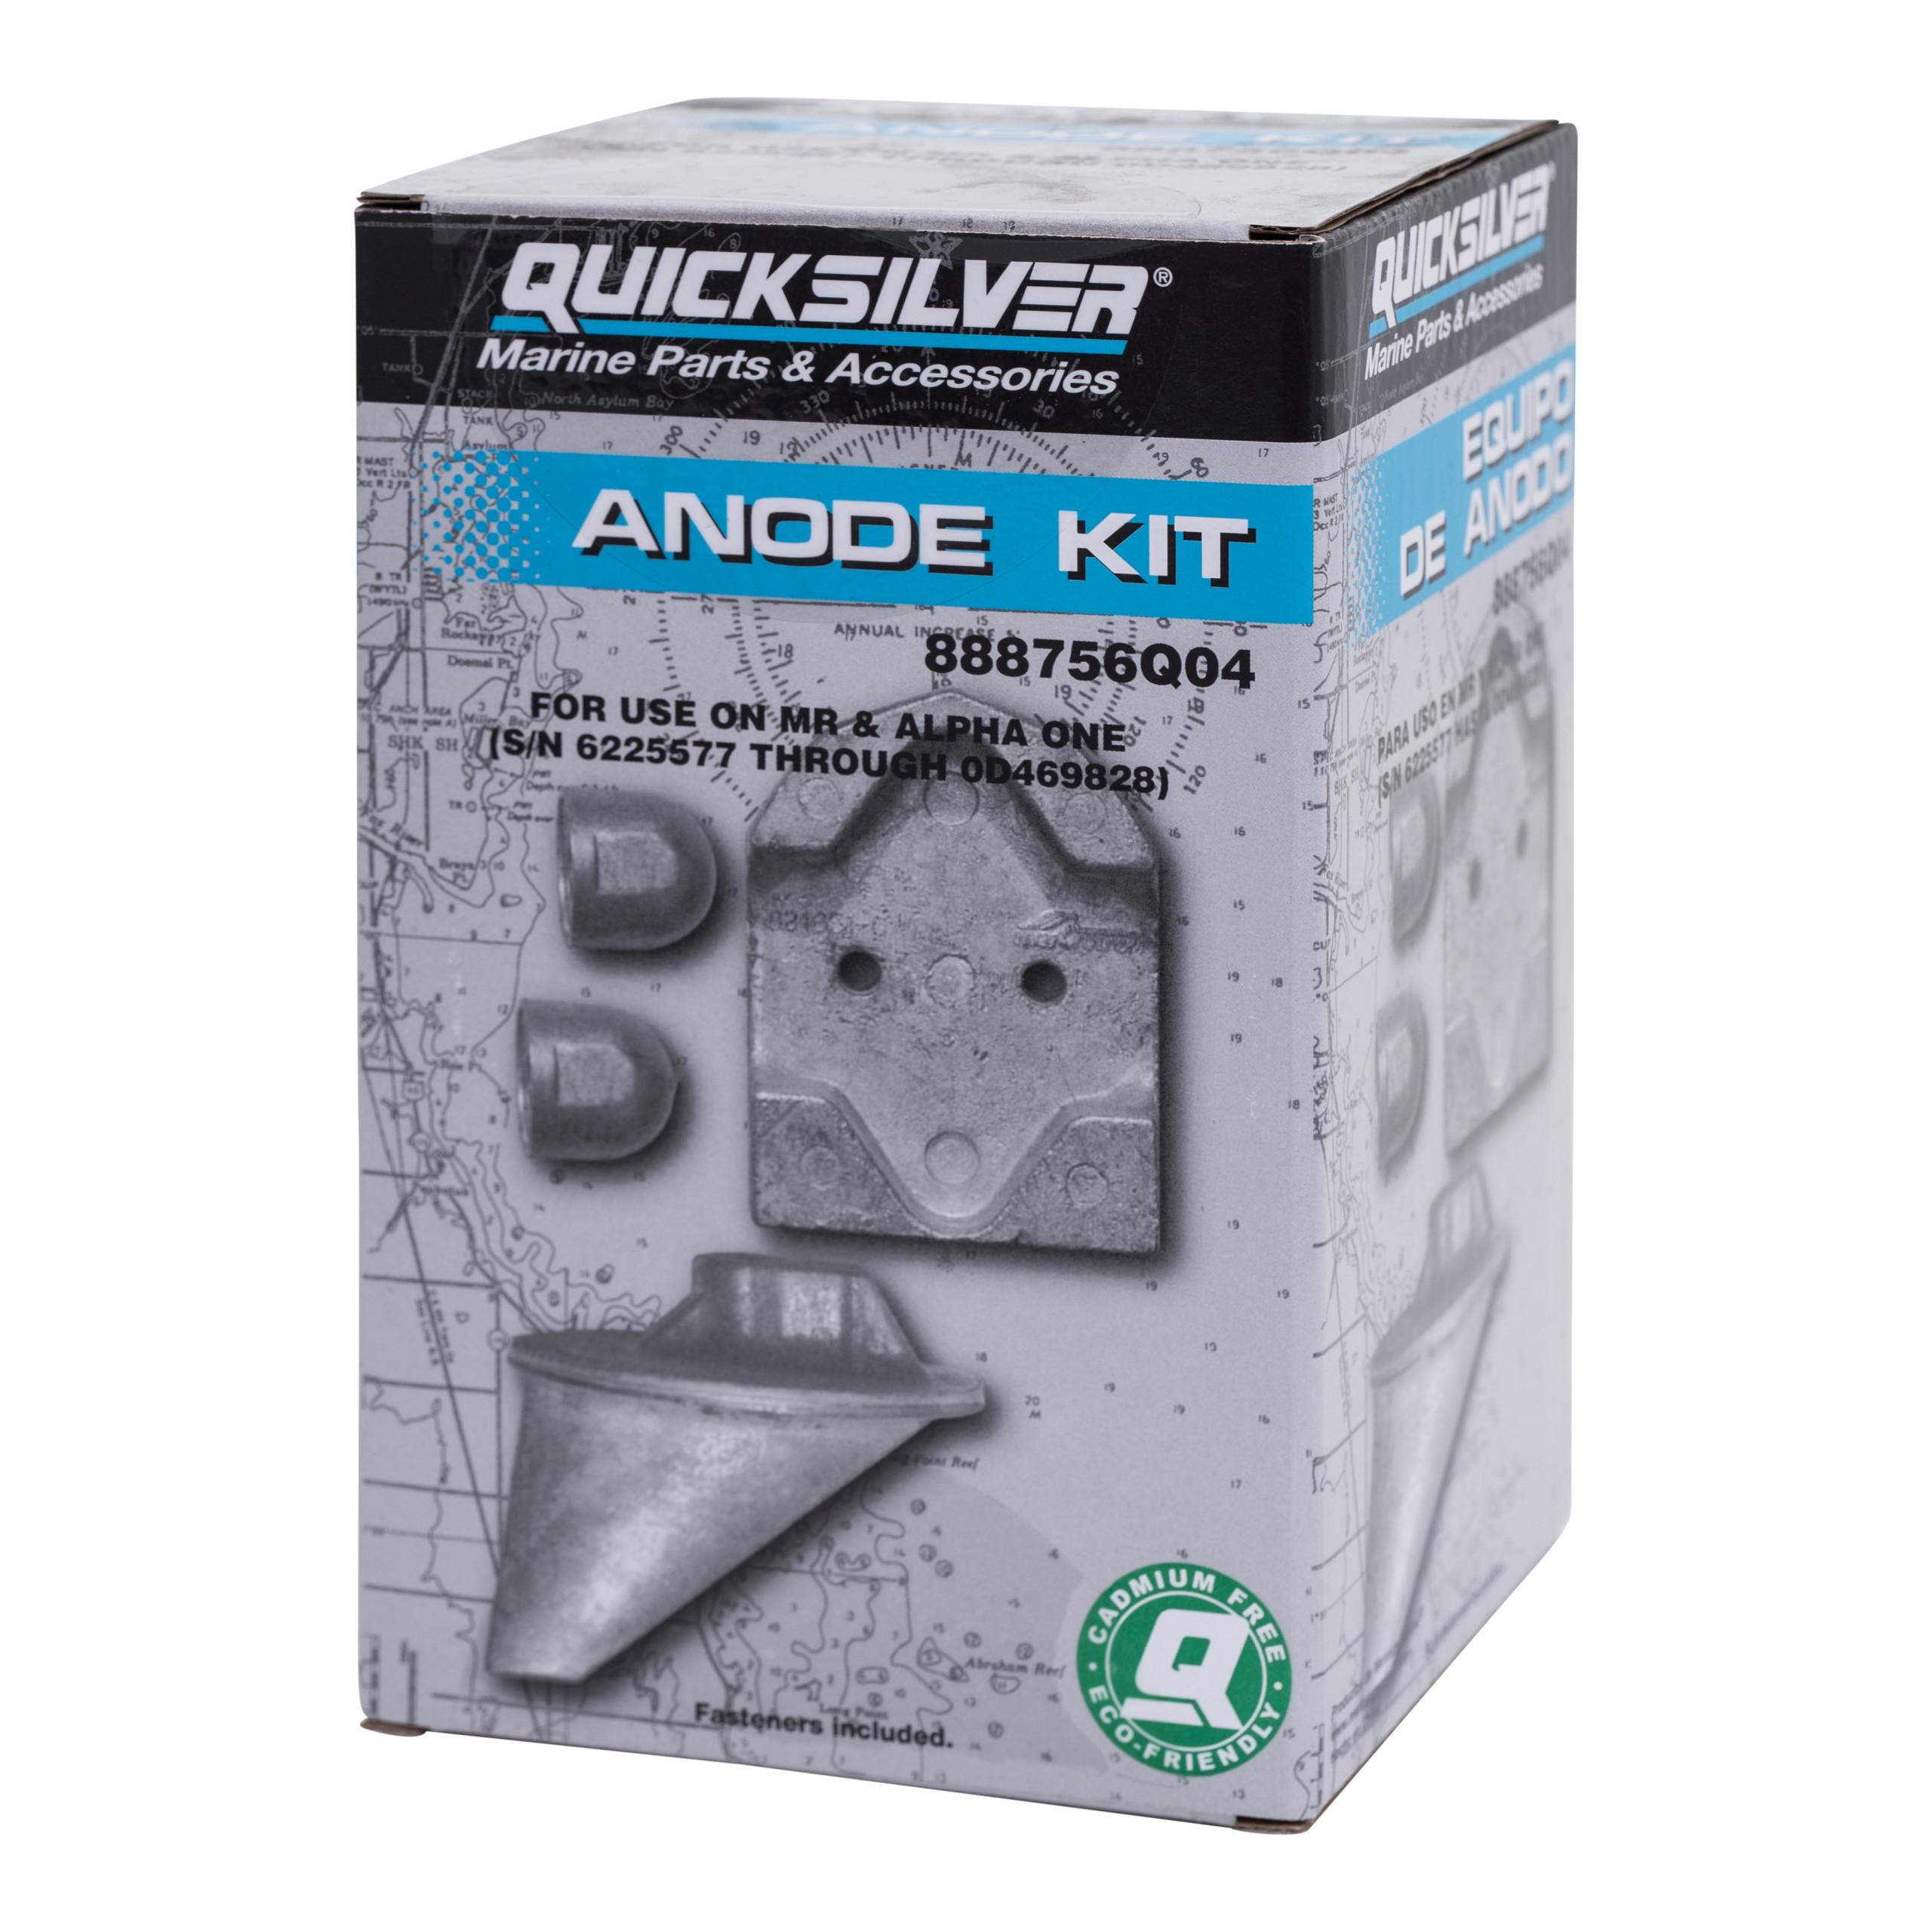 New Mercury Mercruiser Quicksilver Oem Part # 888756Q04 Anode Kit